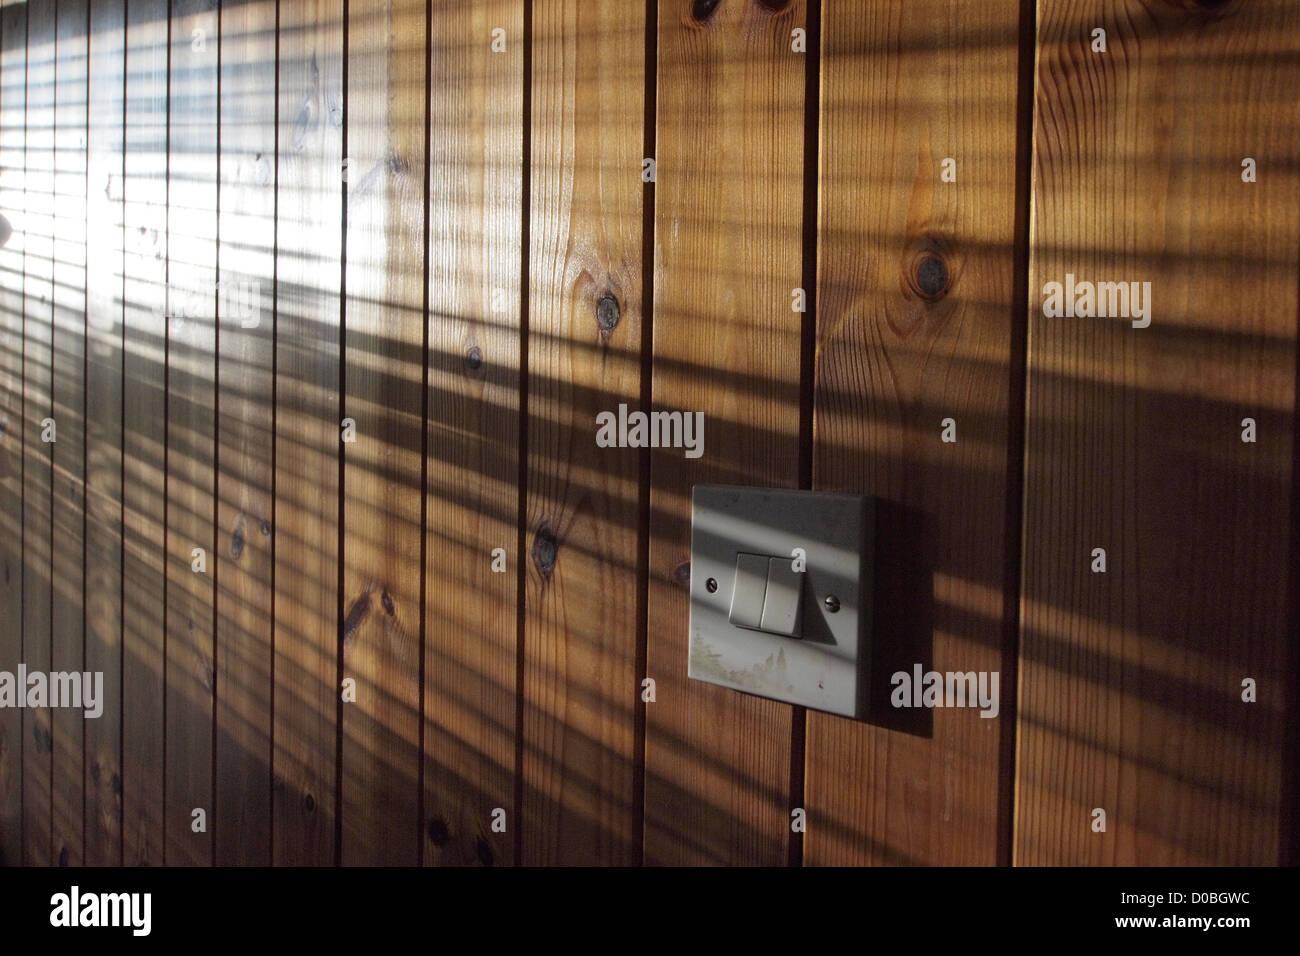 Holzlatte Verkleidung Diy Innere Haus Haus Renovierung Stockfoto